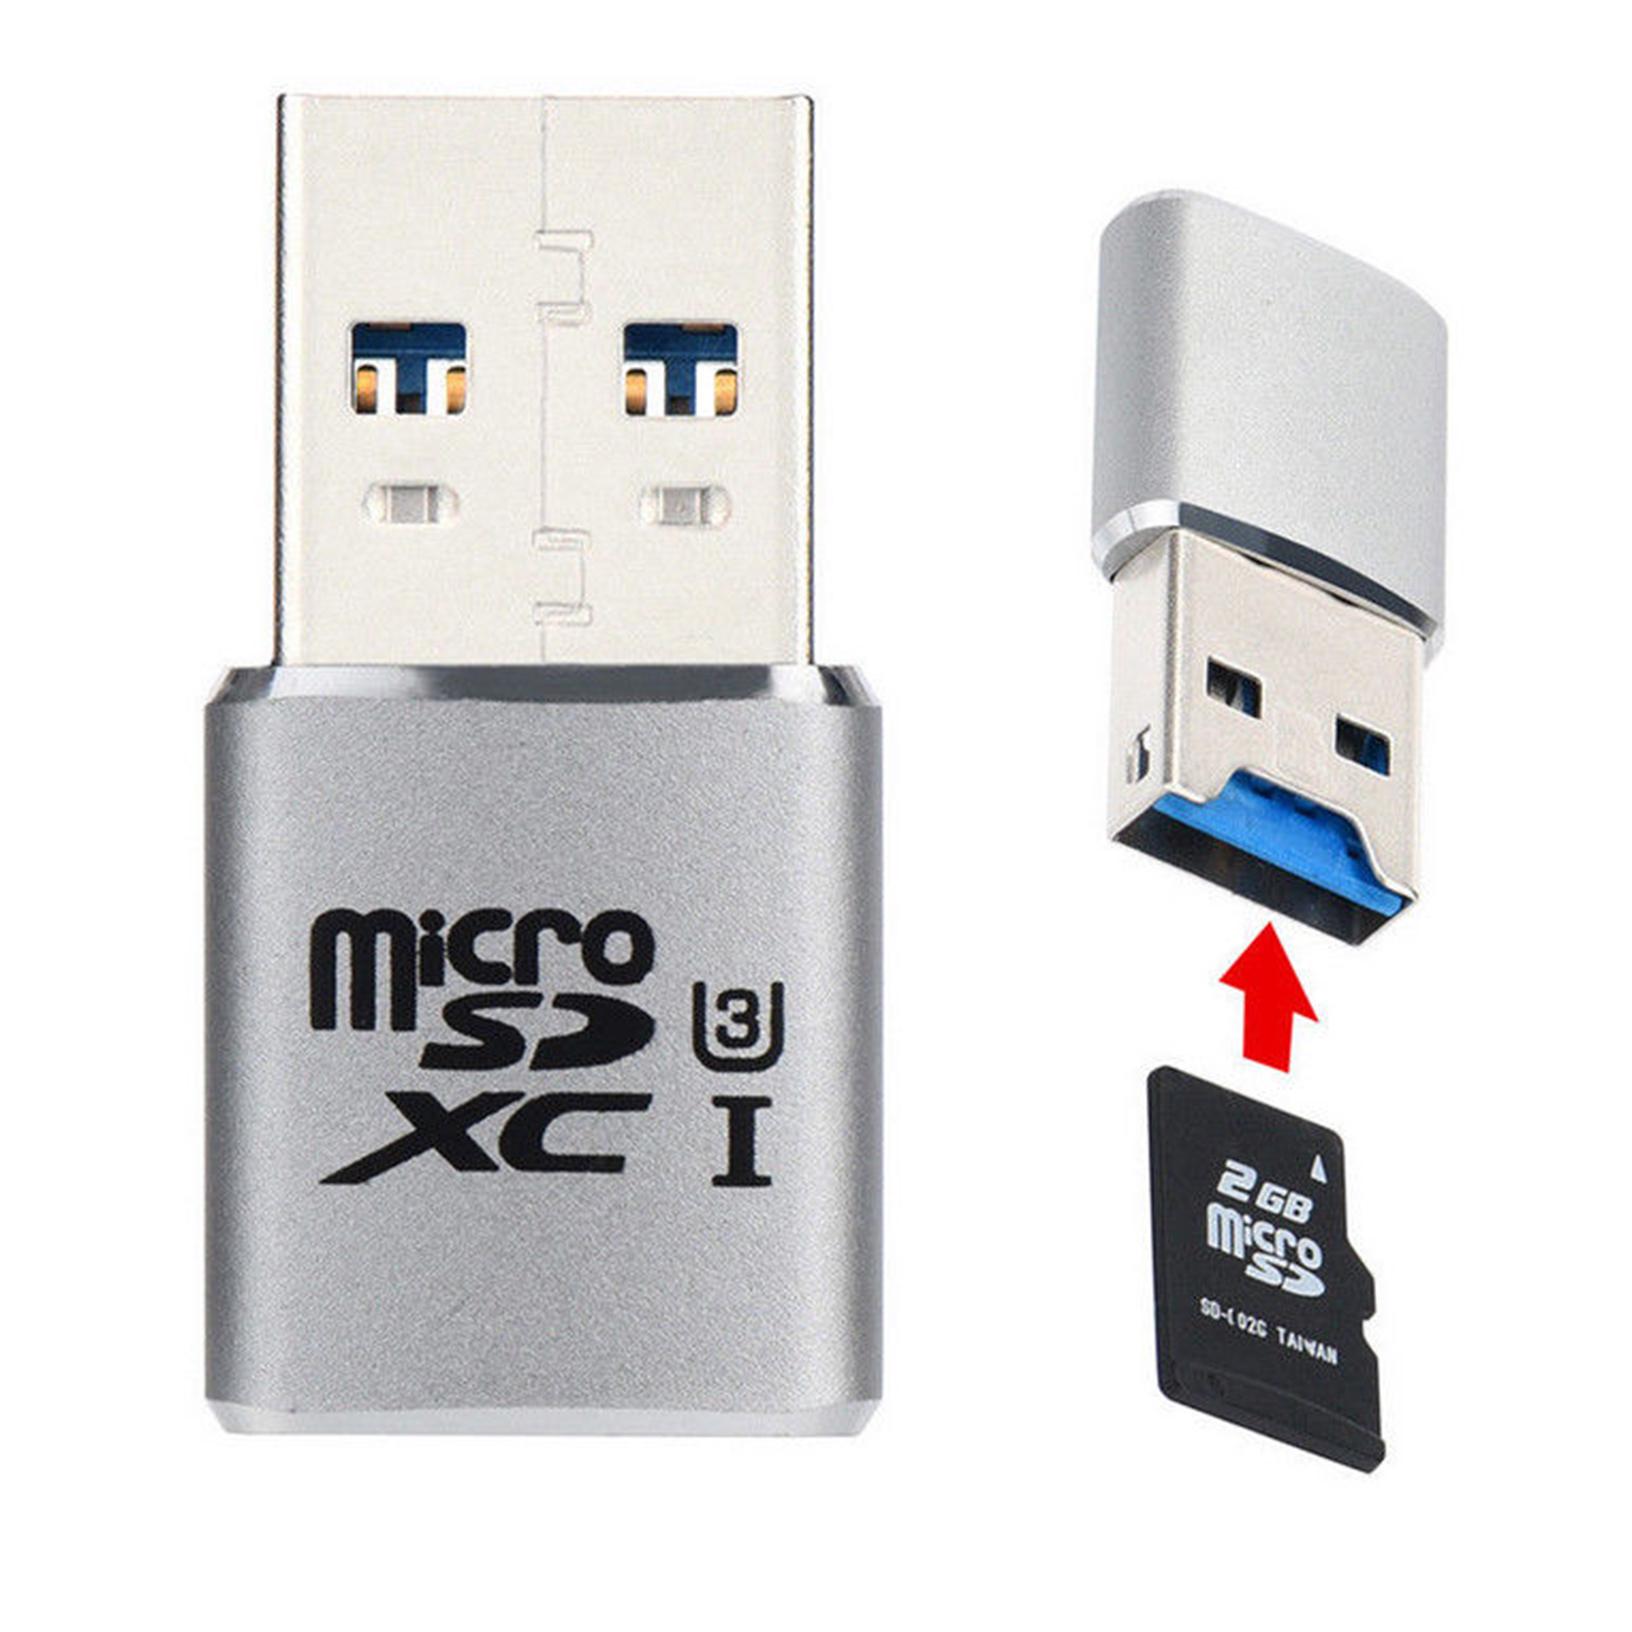 Mini Sd Kartenleser.Details About High Speed Usb 3 0 Mini Card Reader Micro Sd Sdxc Aluminum Tf Card Reader